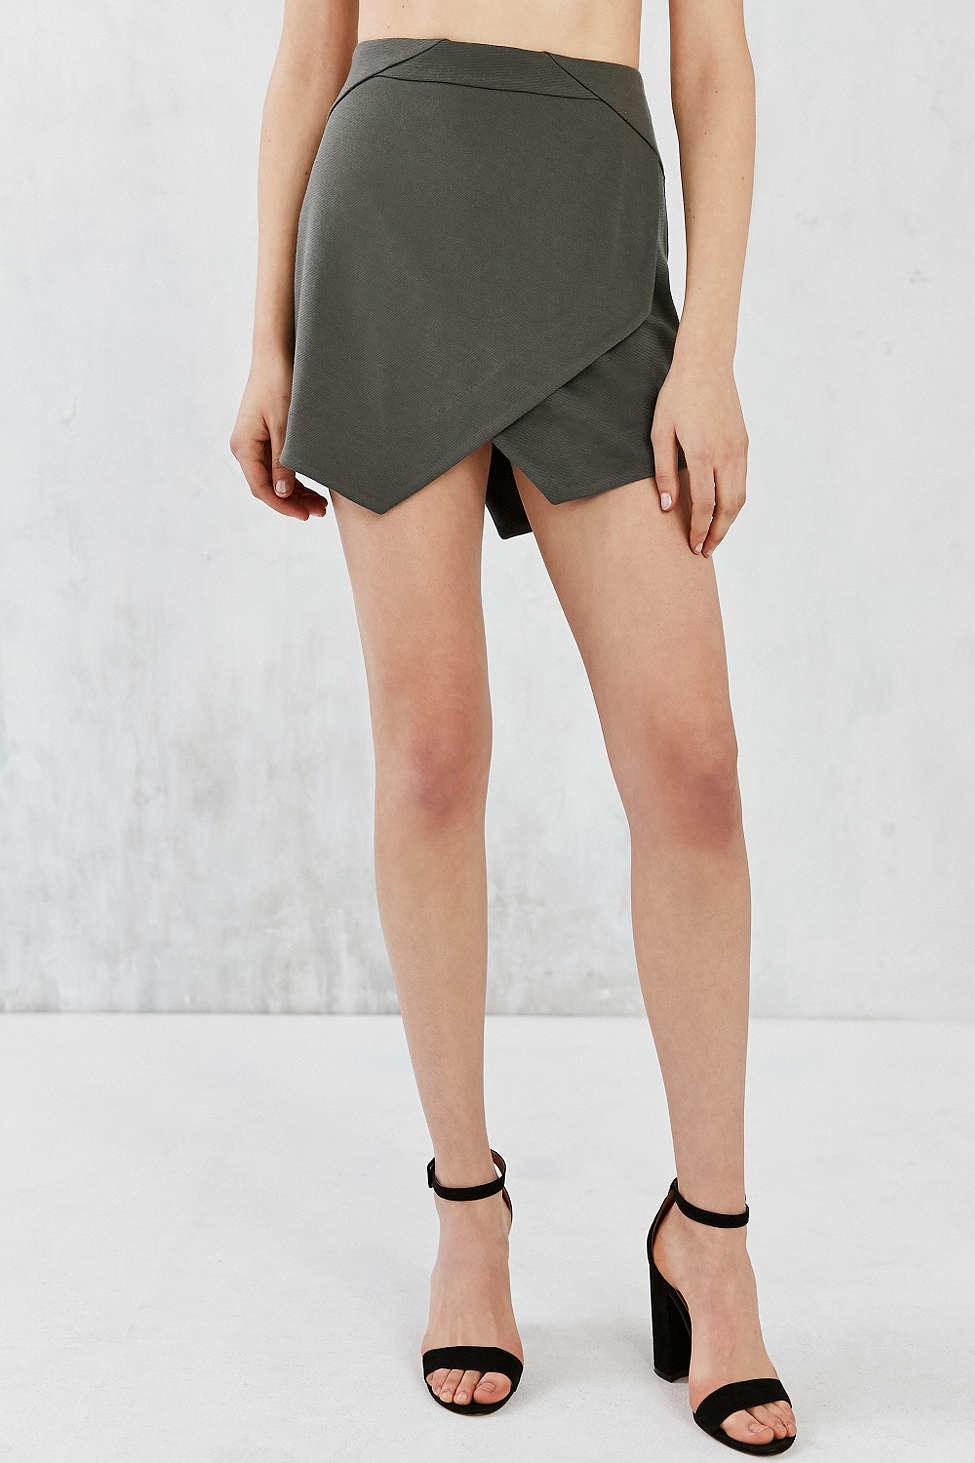 922cec87cb Jack BB Dakota Ponte D'oro Mini Skirt in Green - Lyst